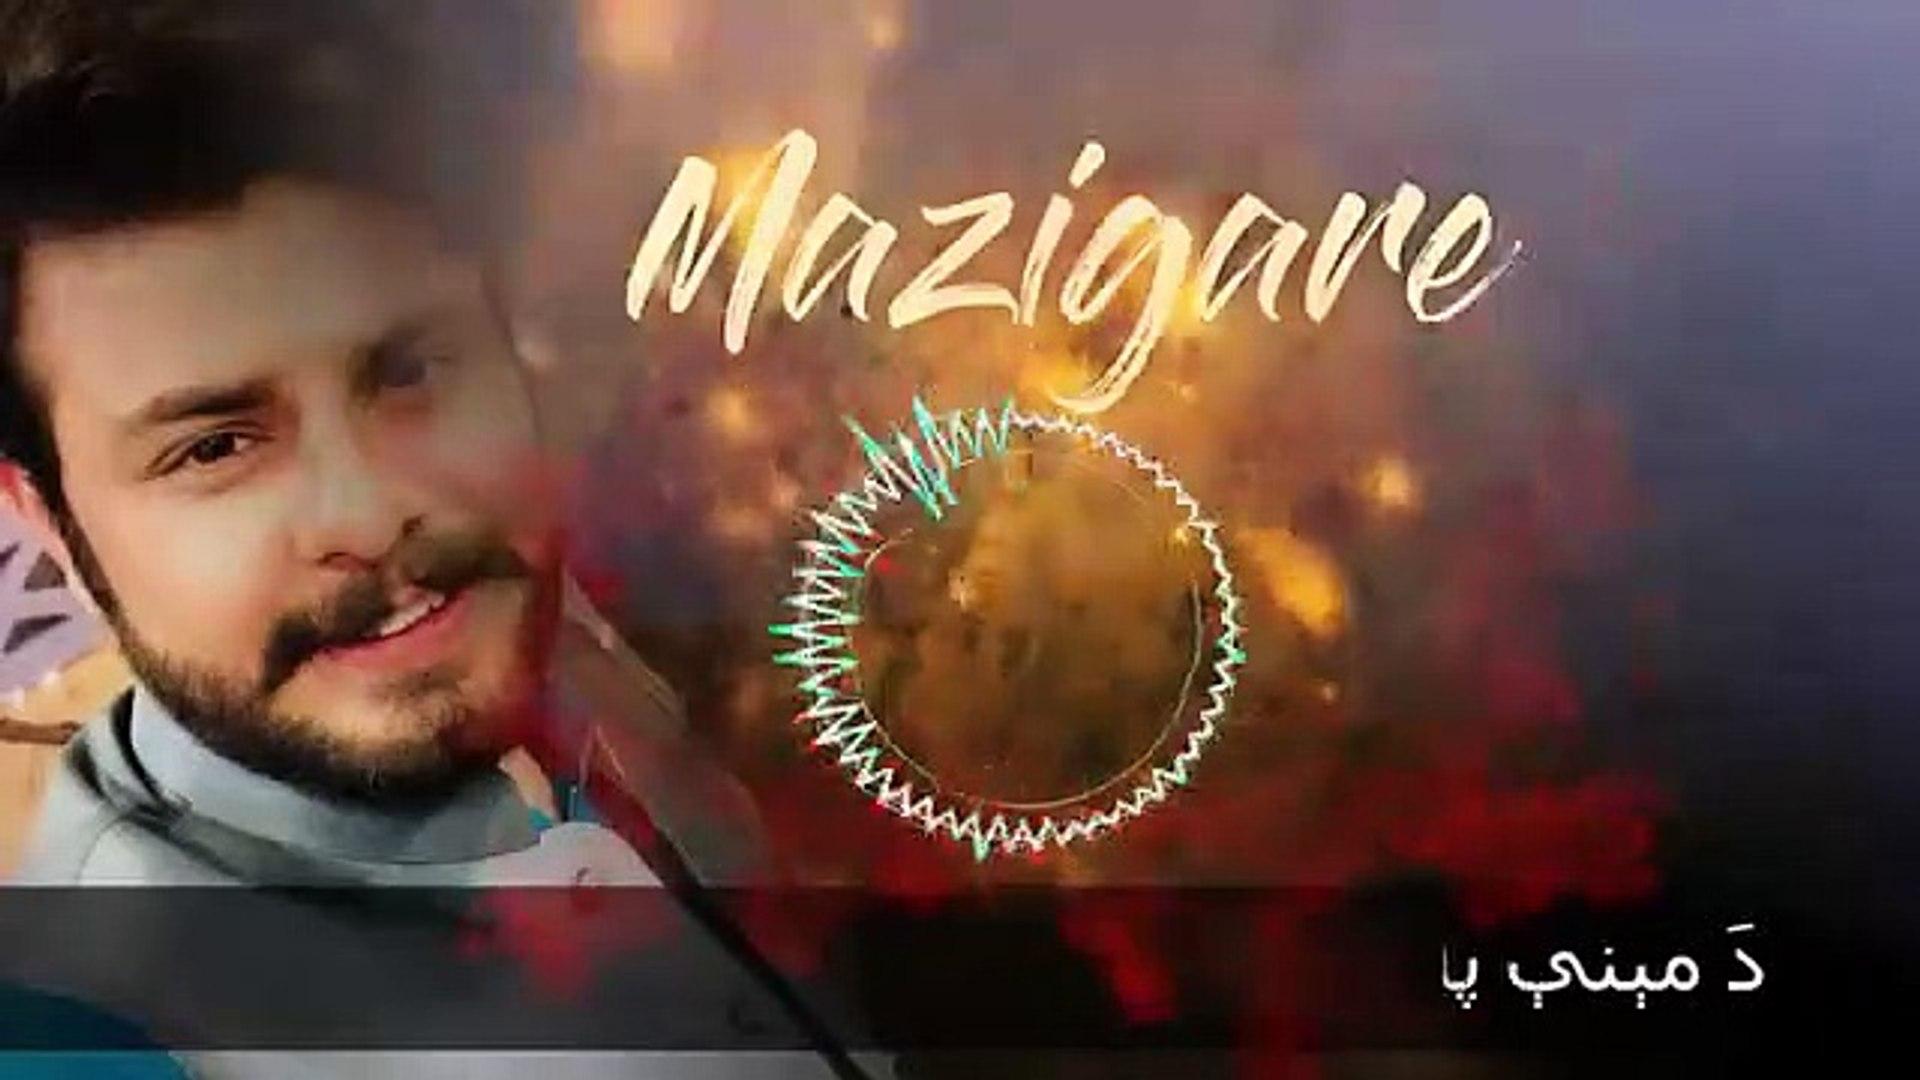 Zubair Nawaz Mazigare New Pashto پشتو Song 2019 Official HD Video